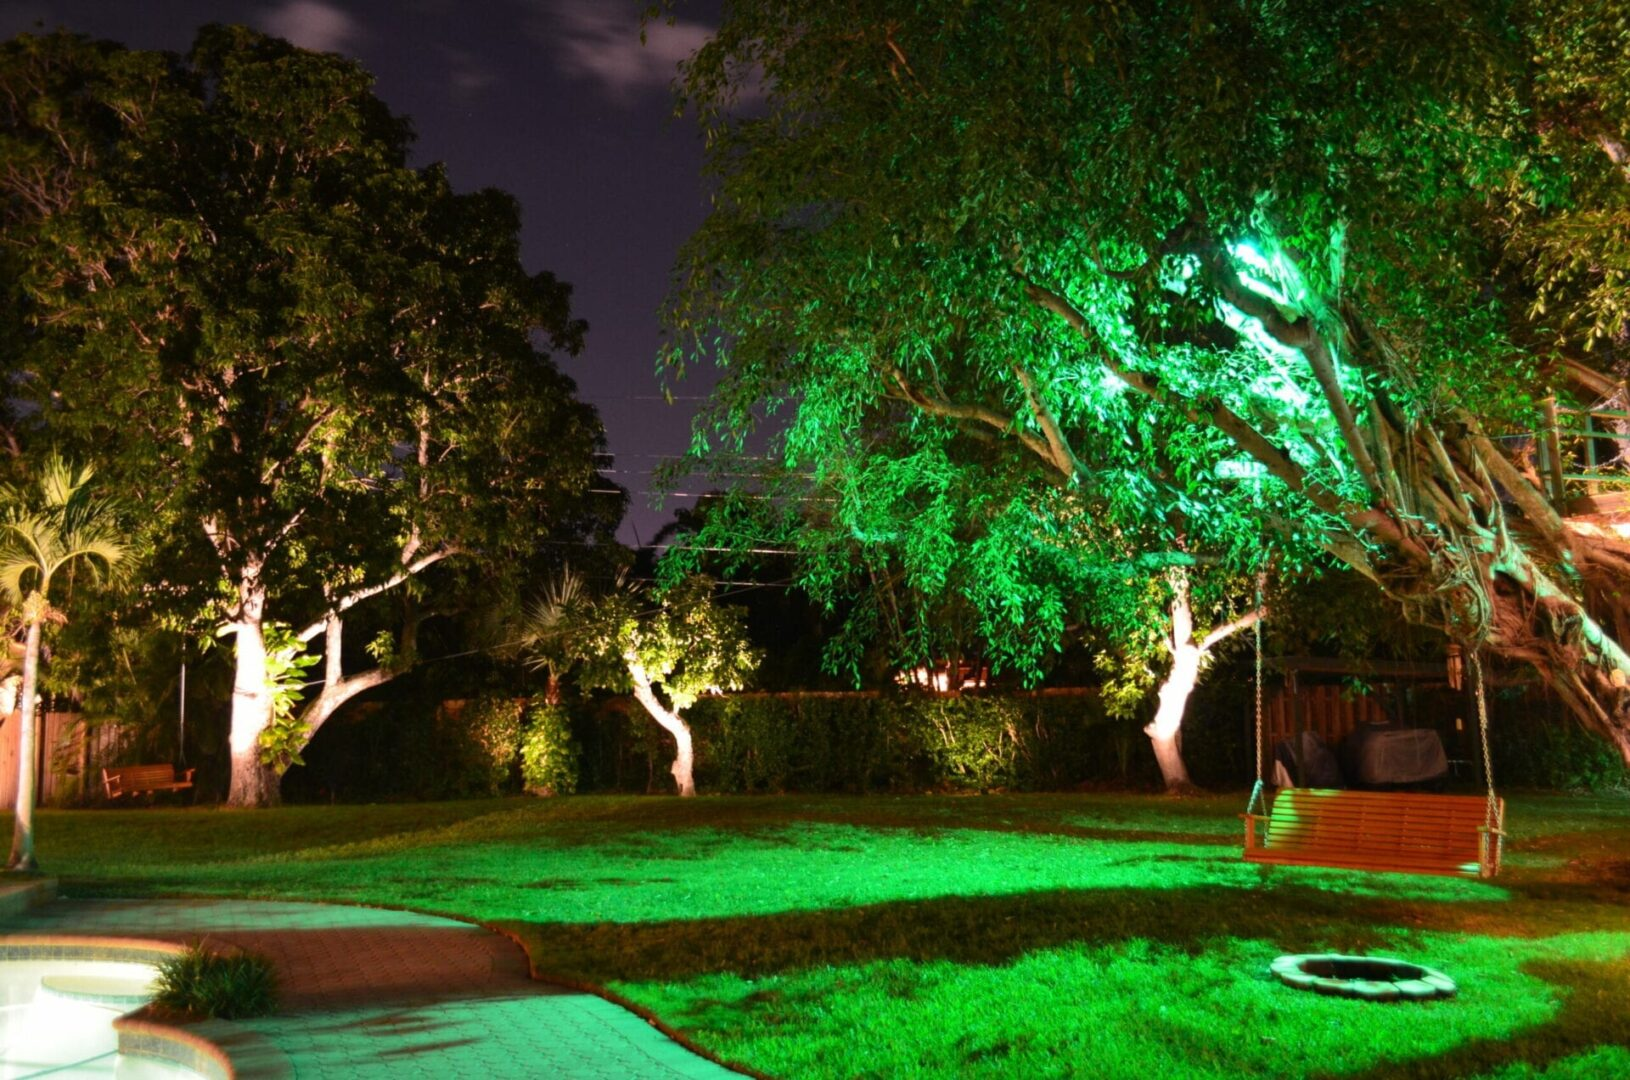 Leisure LED Landscape Lighting